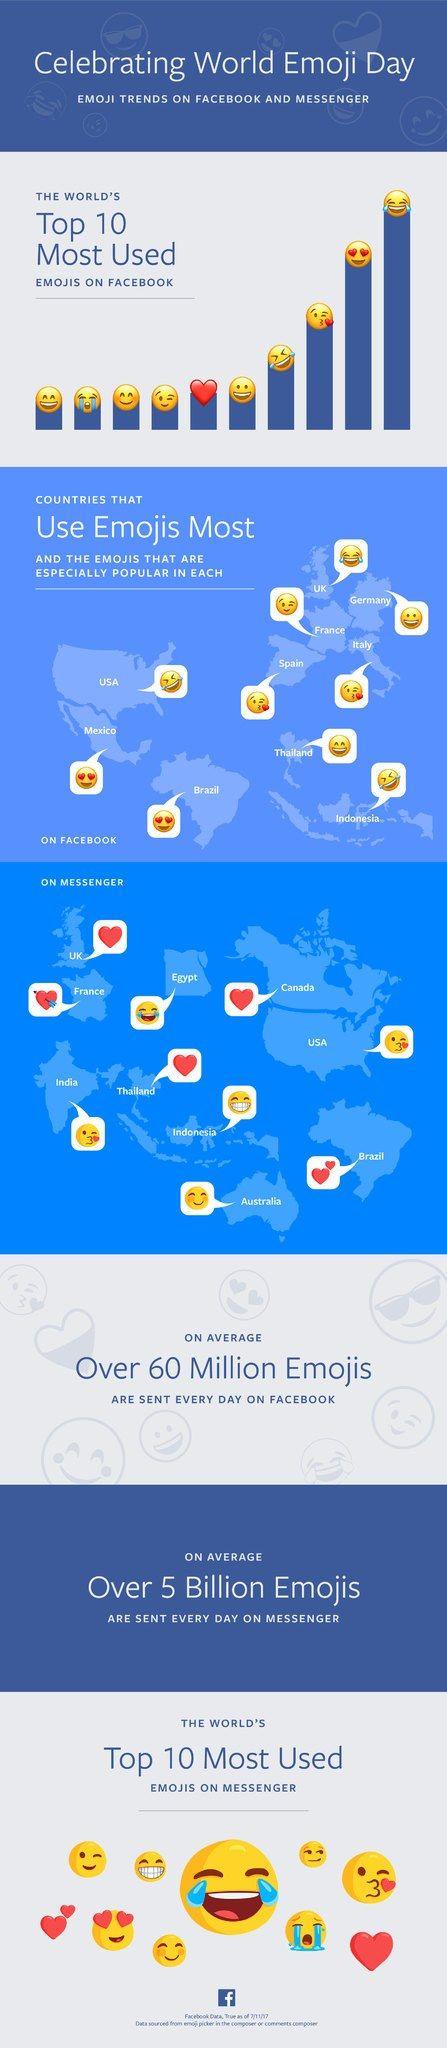 6 Mind-Blowing Emoji Facts in Honor of World Emoji Day